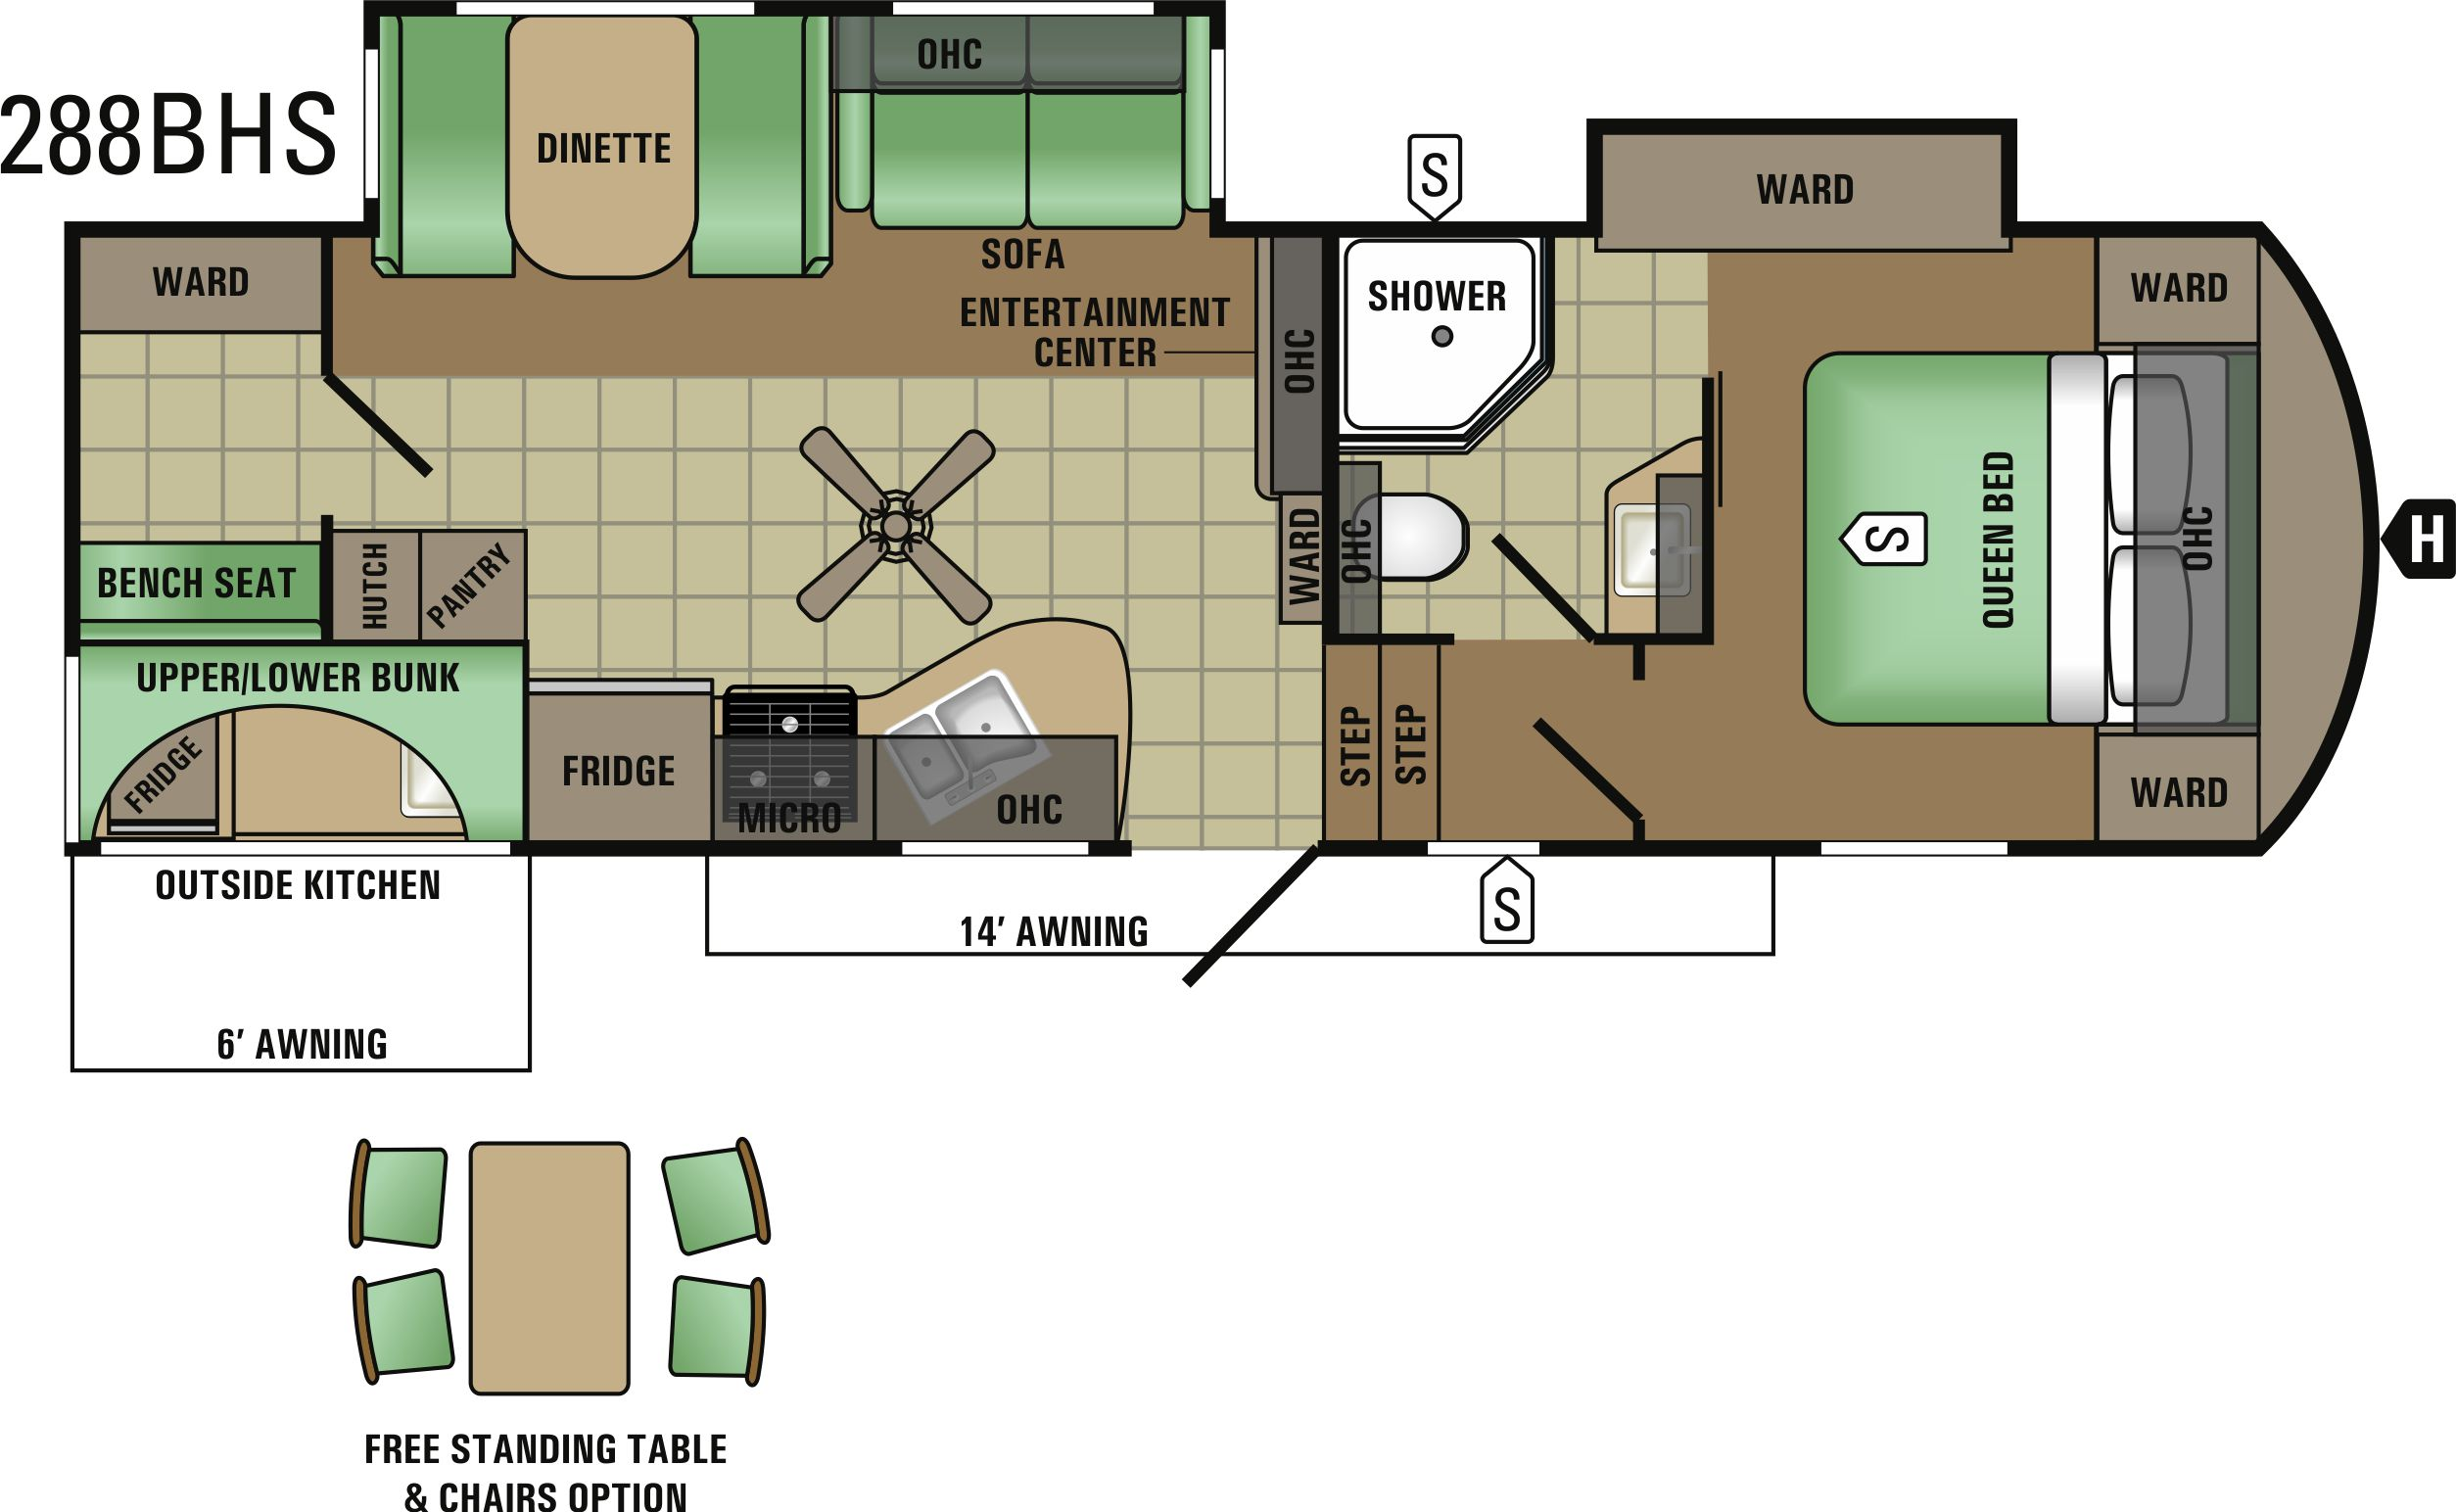 288BHS Floorplan